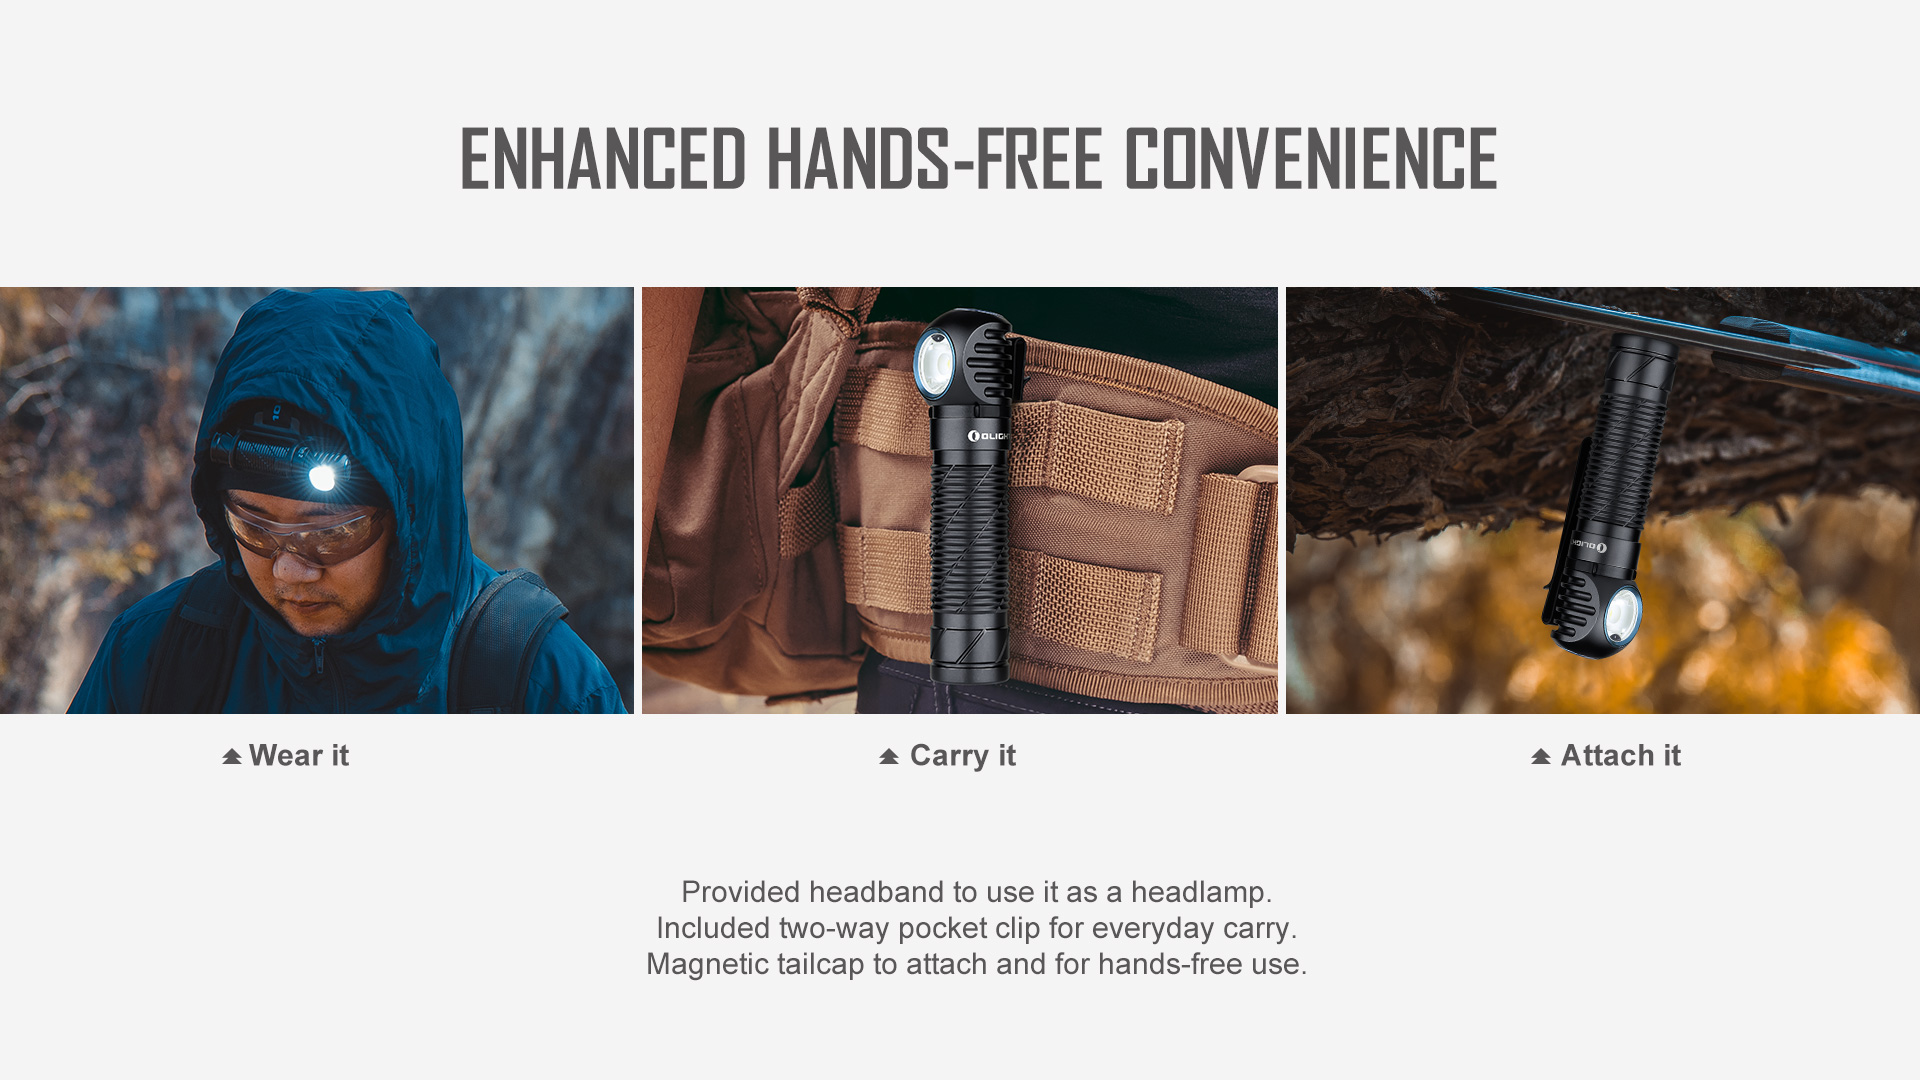 perun 2 Enhanced Hands-free Convenience